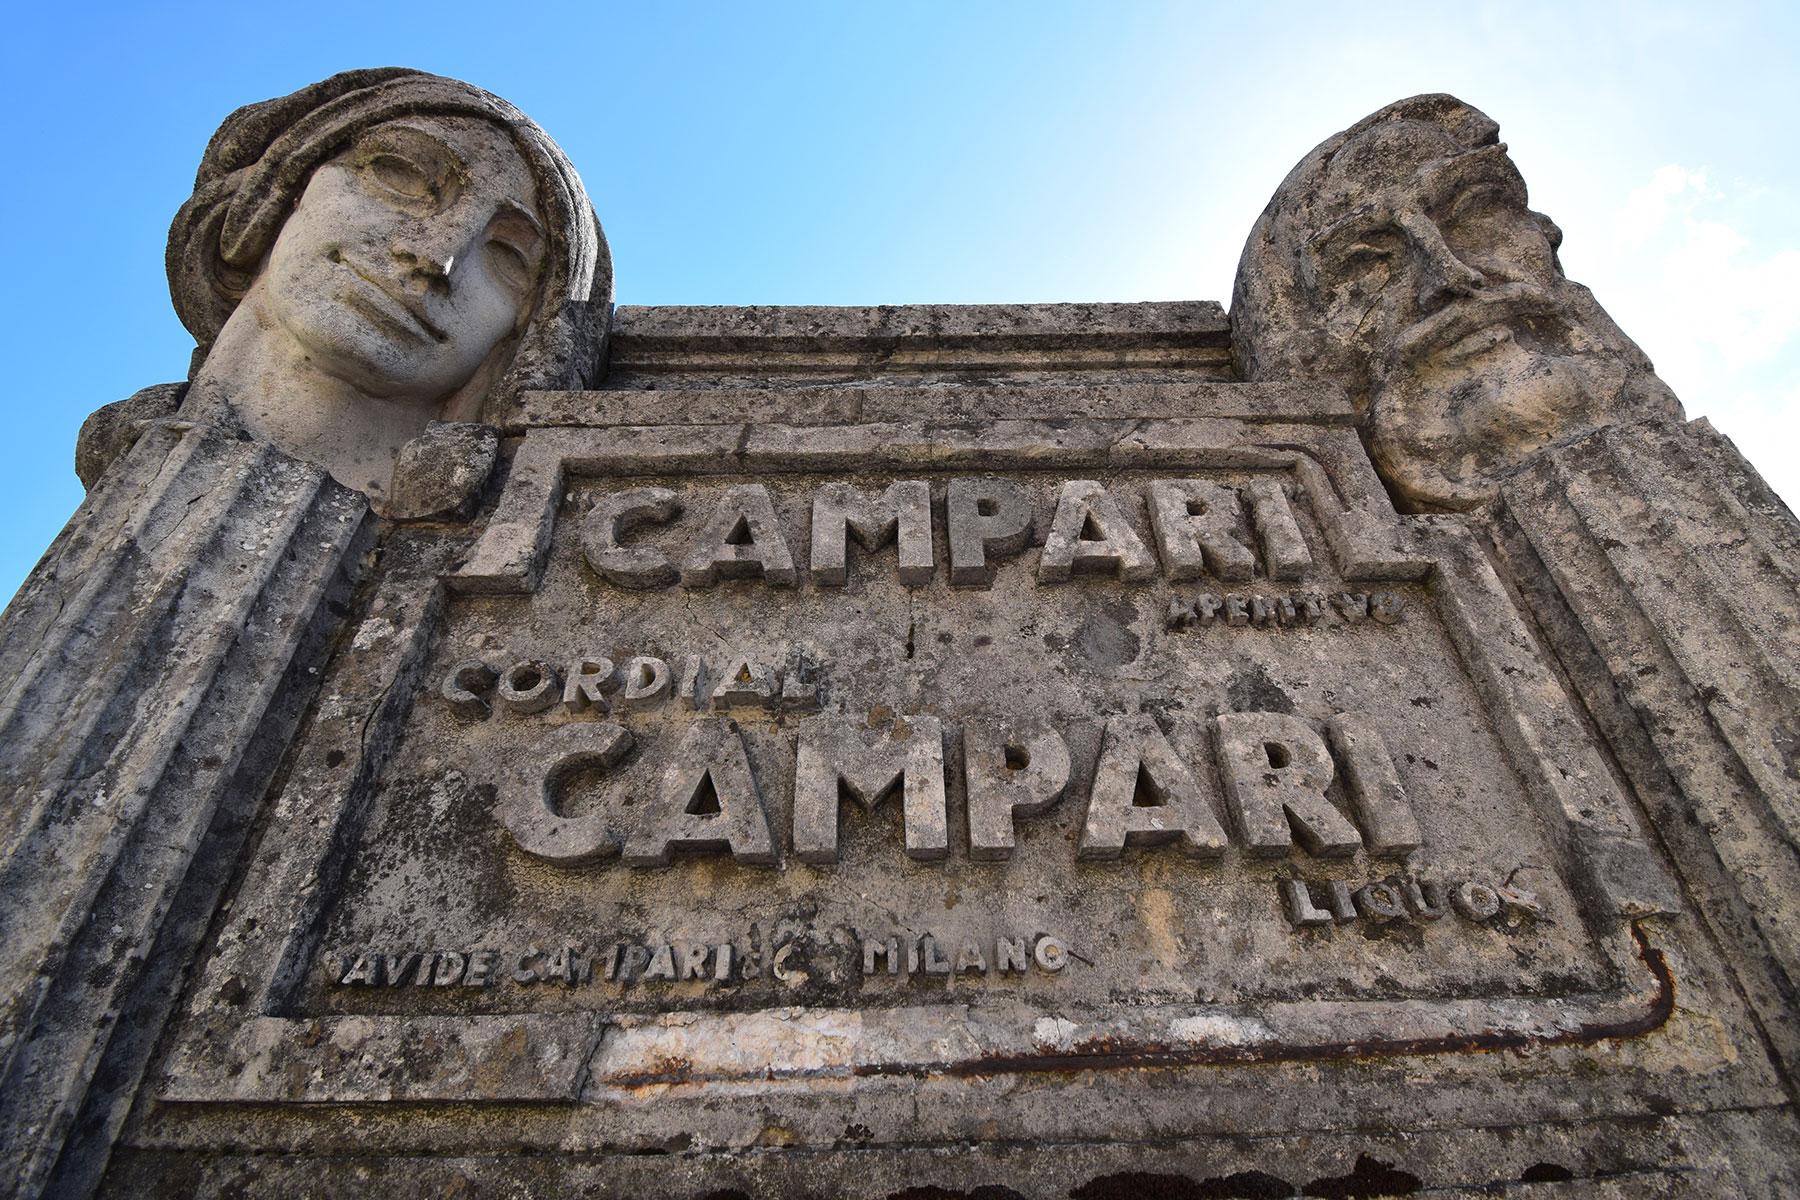 Le Fontane Campari